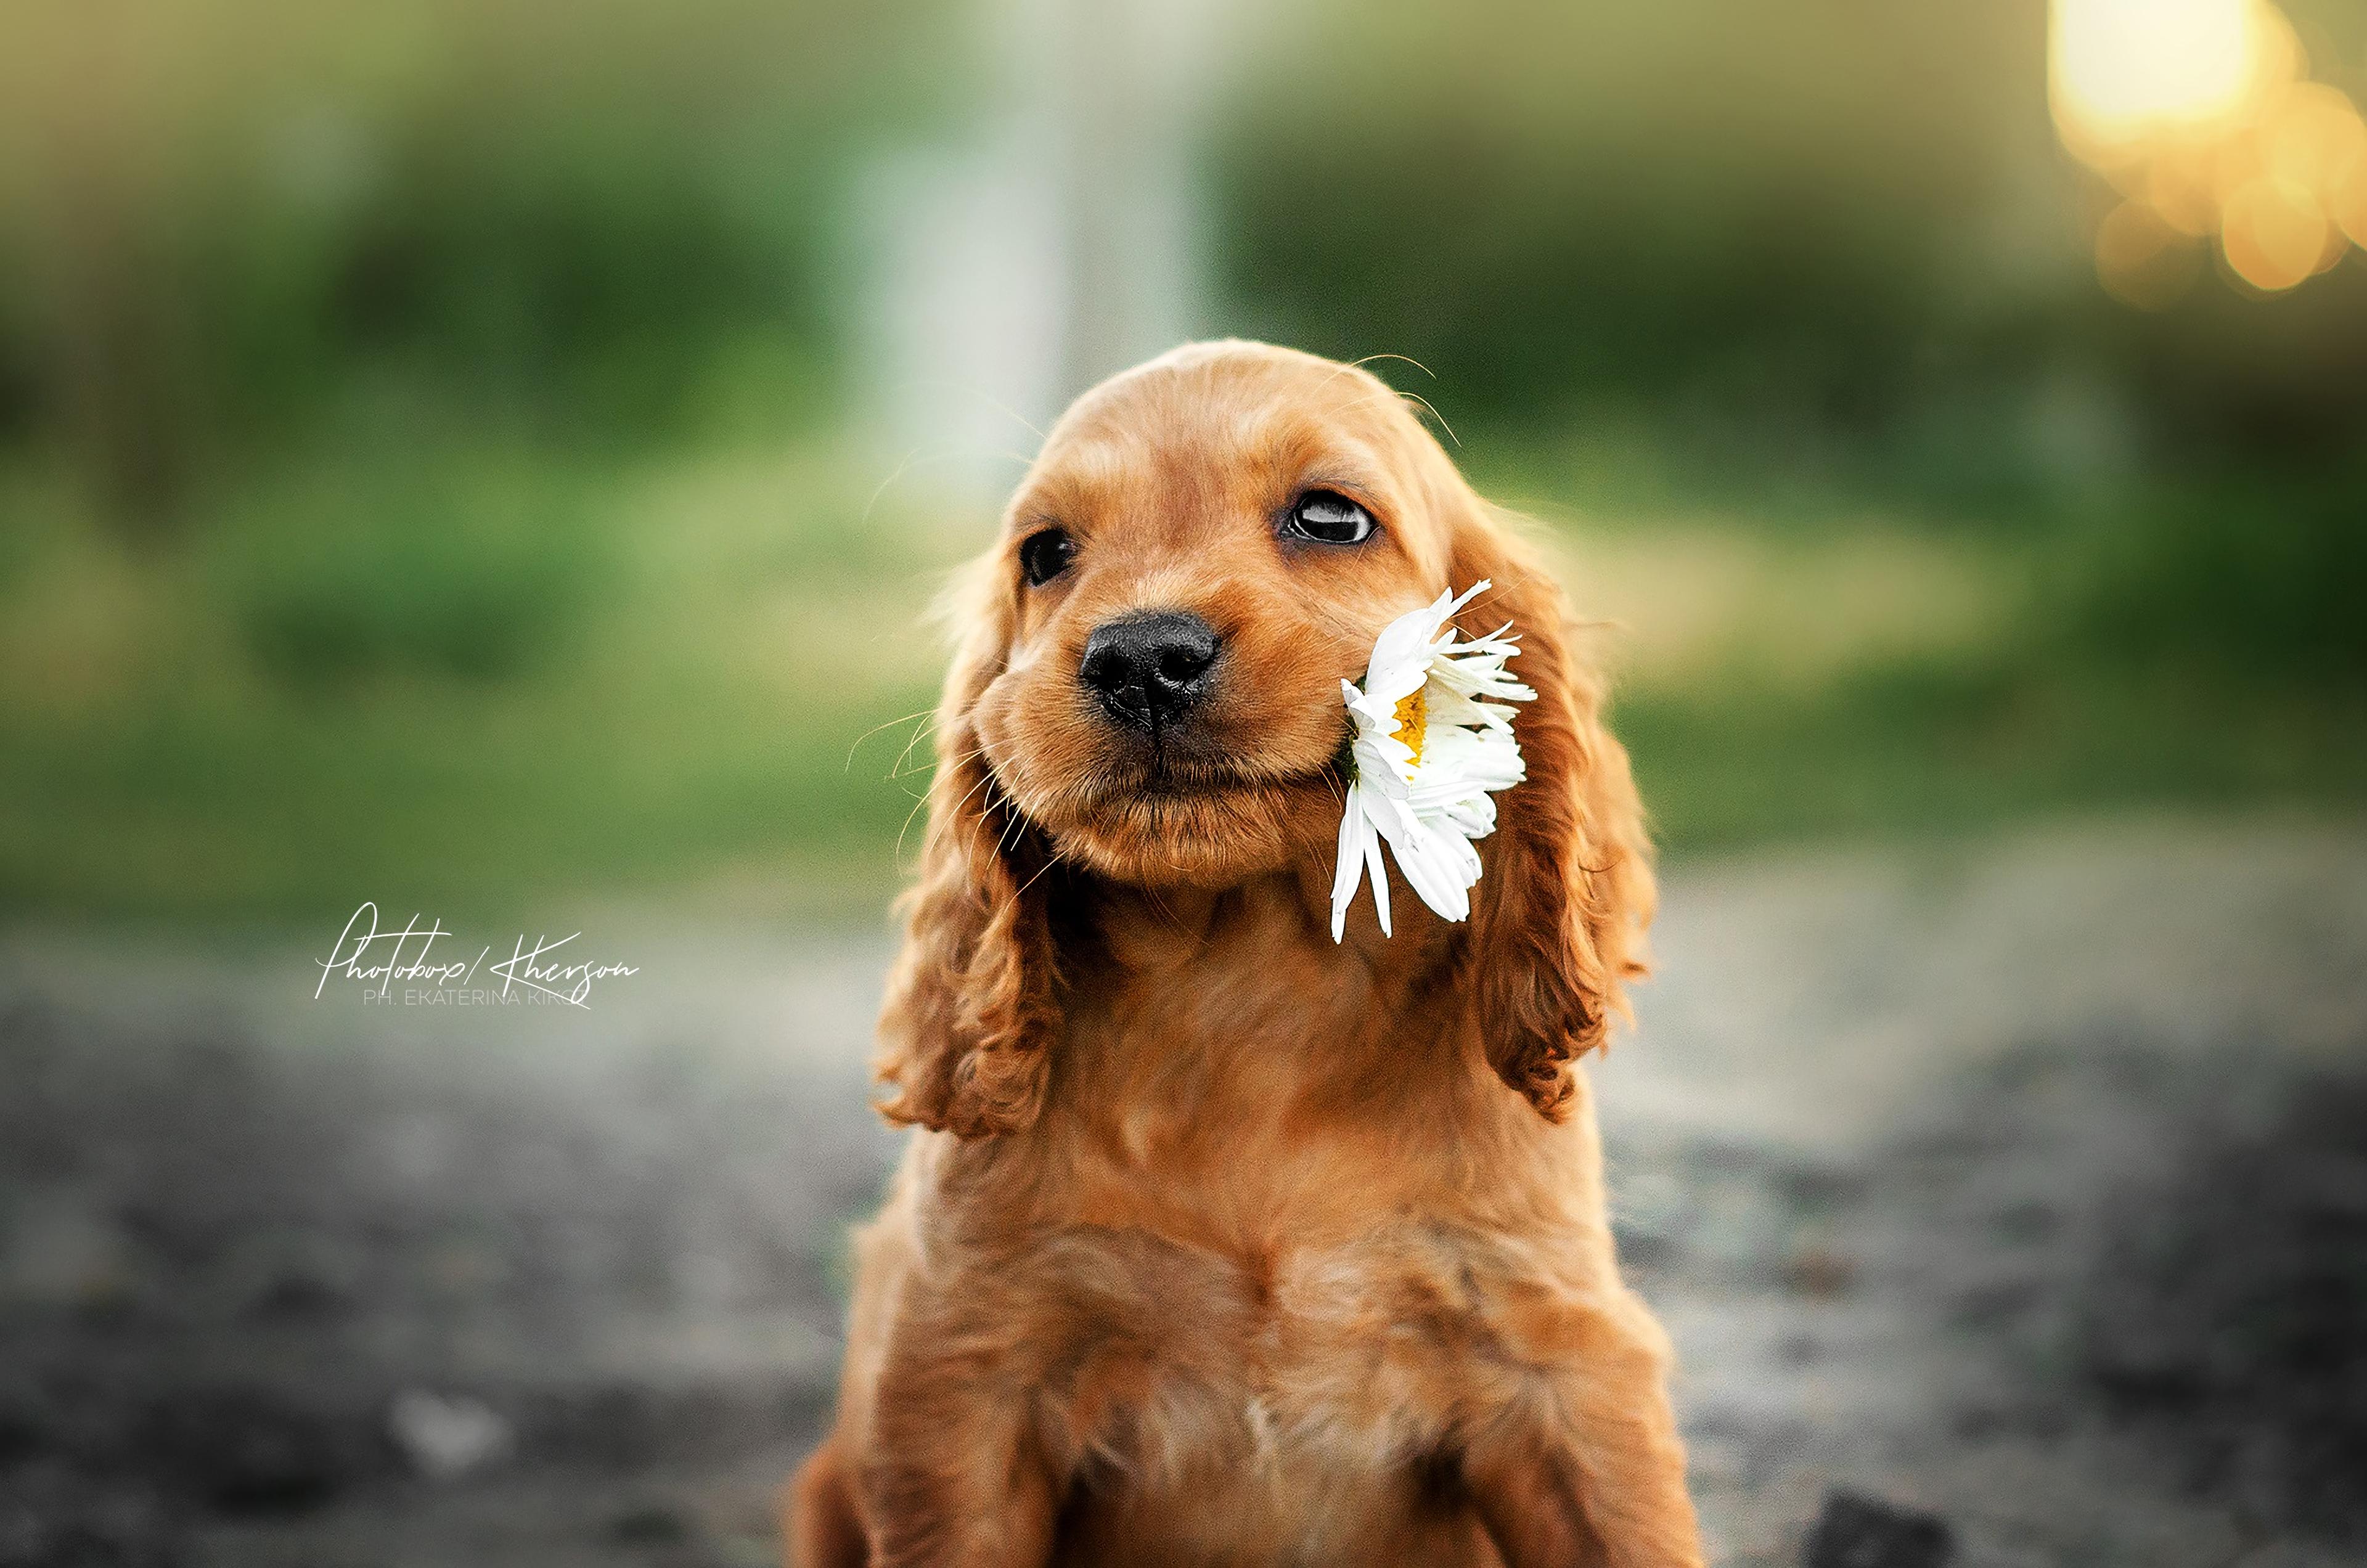 dog with flower in mouth 1574938221 - Dog With Flower In Mouth -